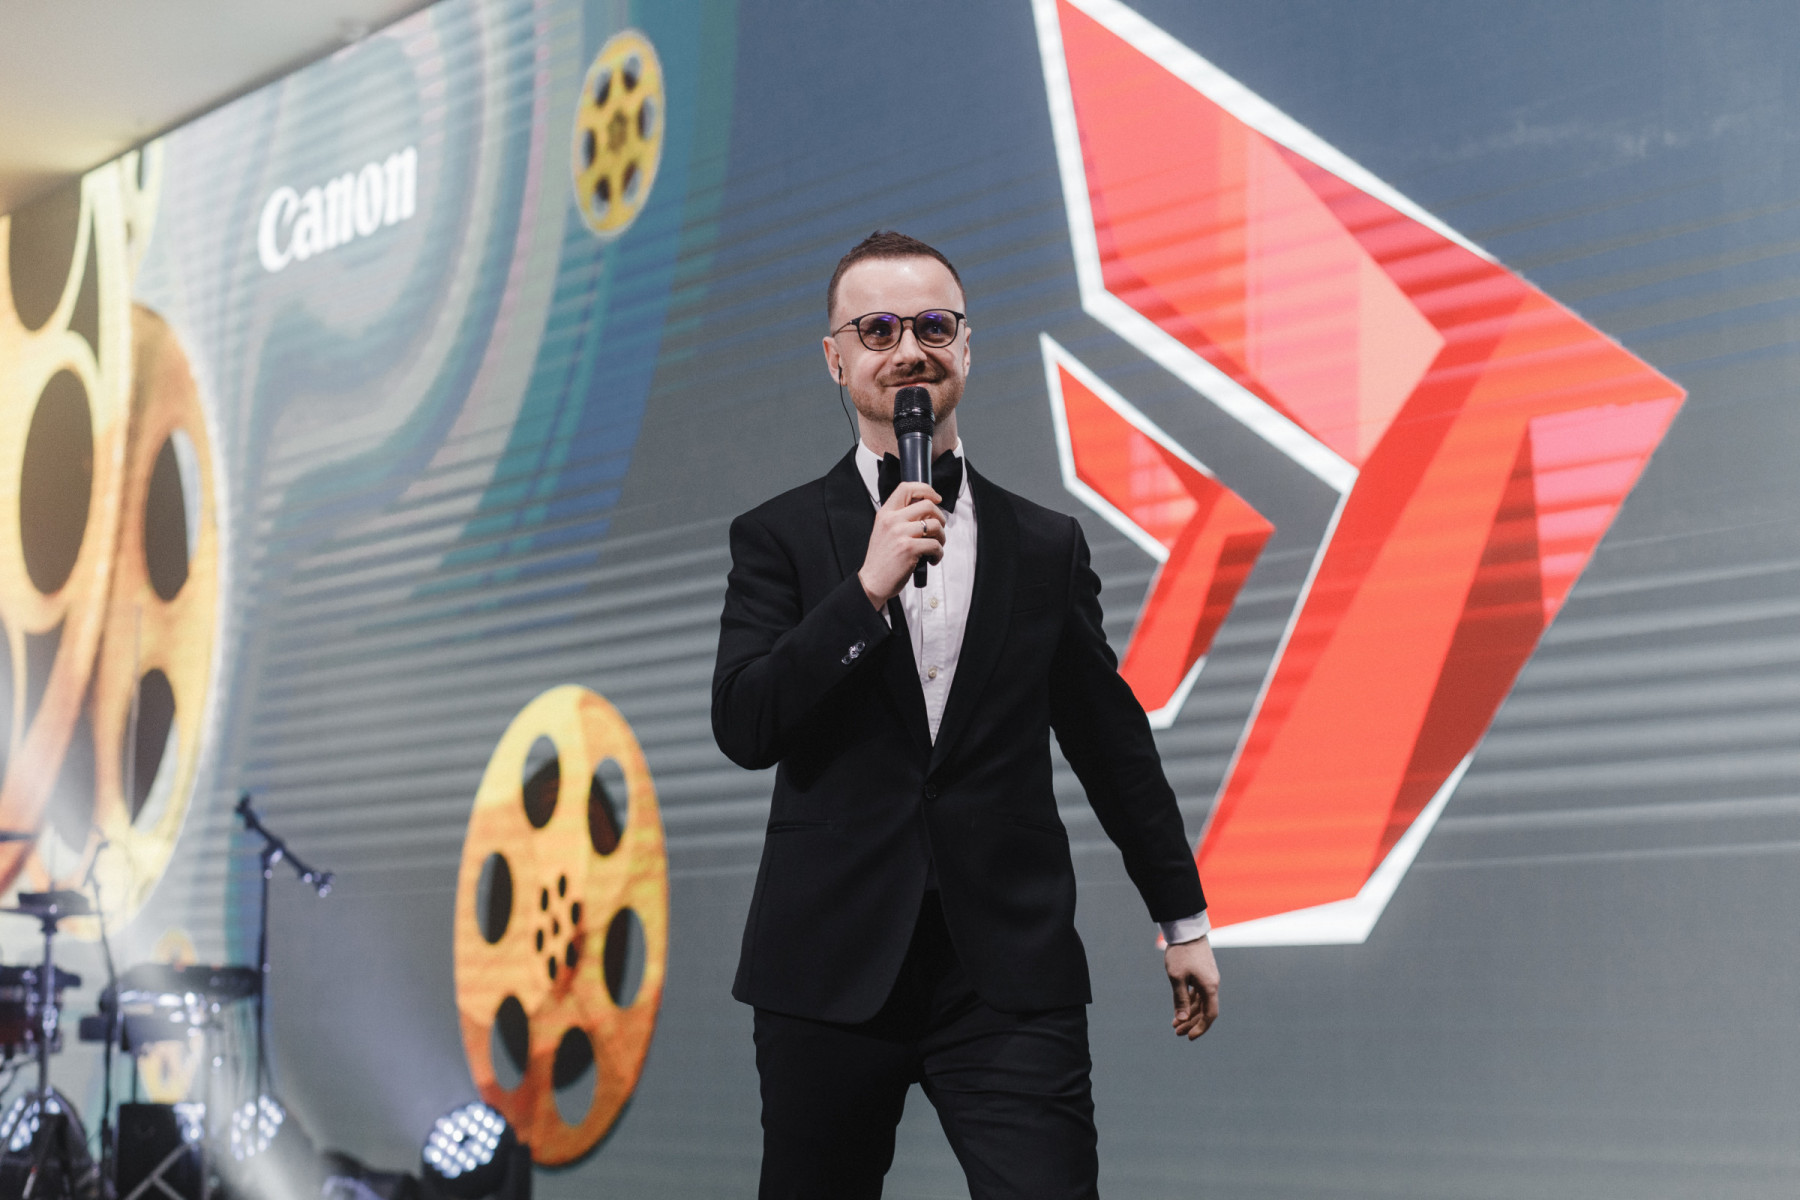 Михаил Белянин: о Comedy Radio, семье и